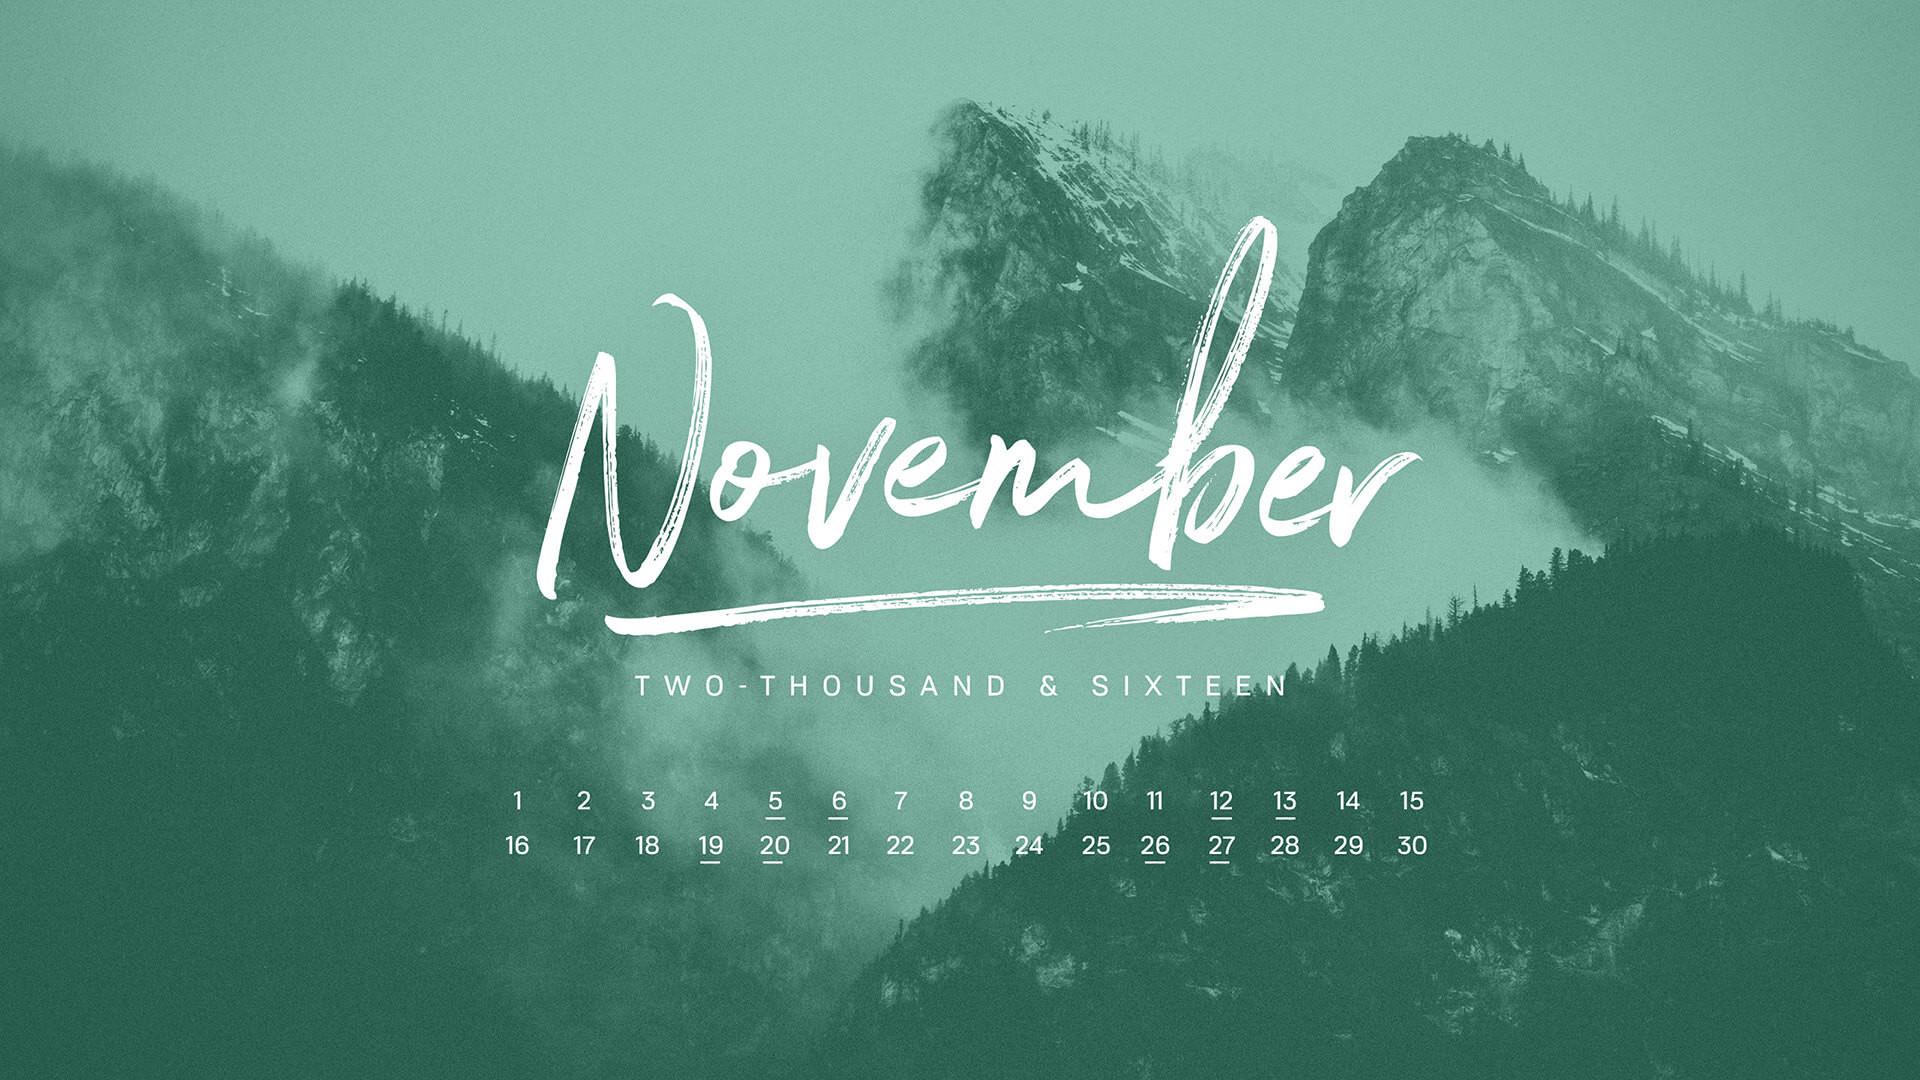 November 2016 Desktop Calendar Wallpaper